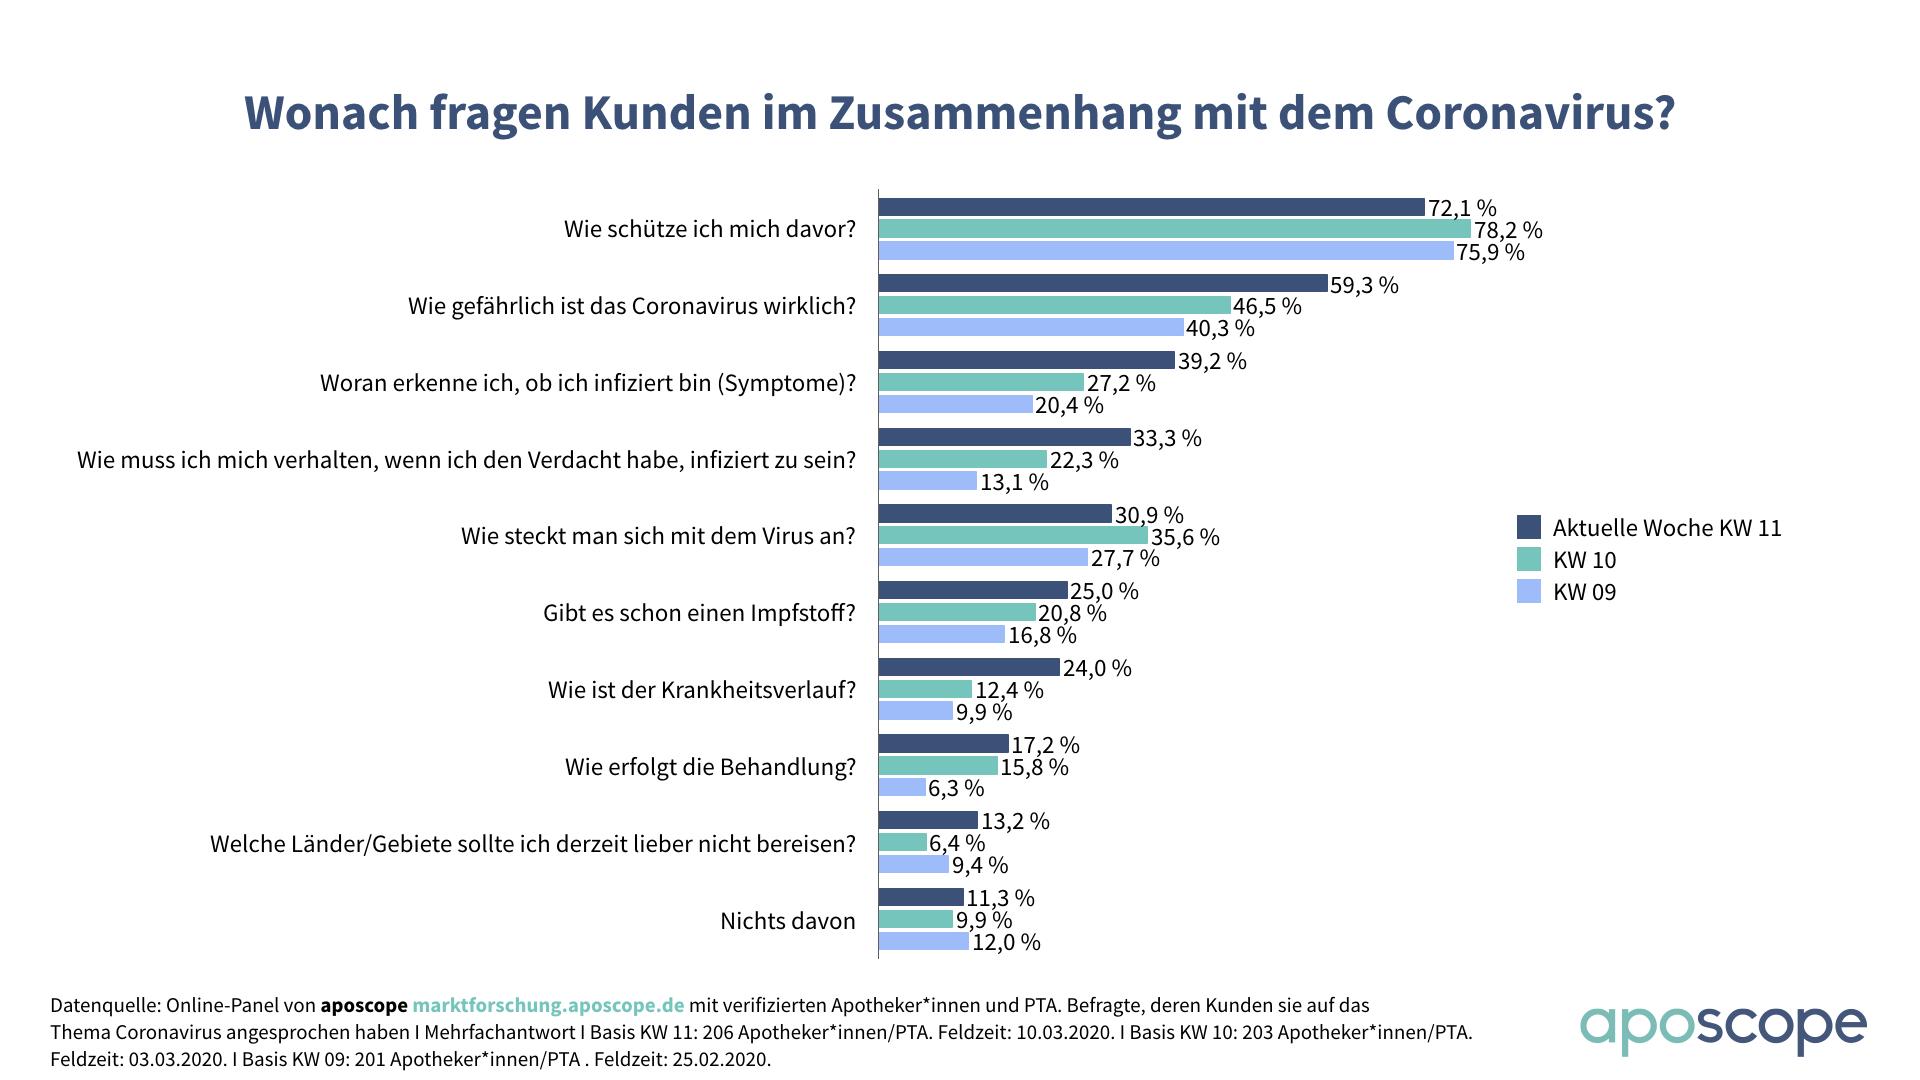 aposcope_Umfrage_Coronavirus_Kundenfragen